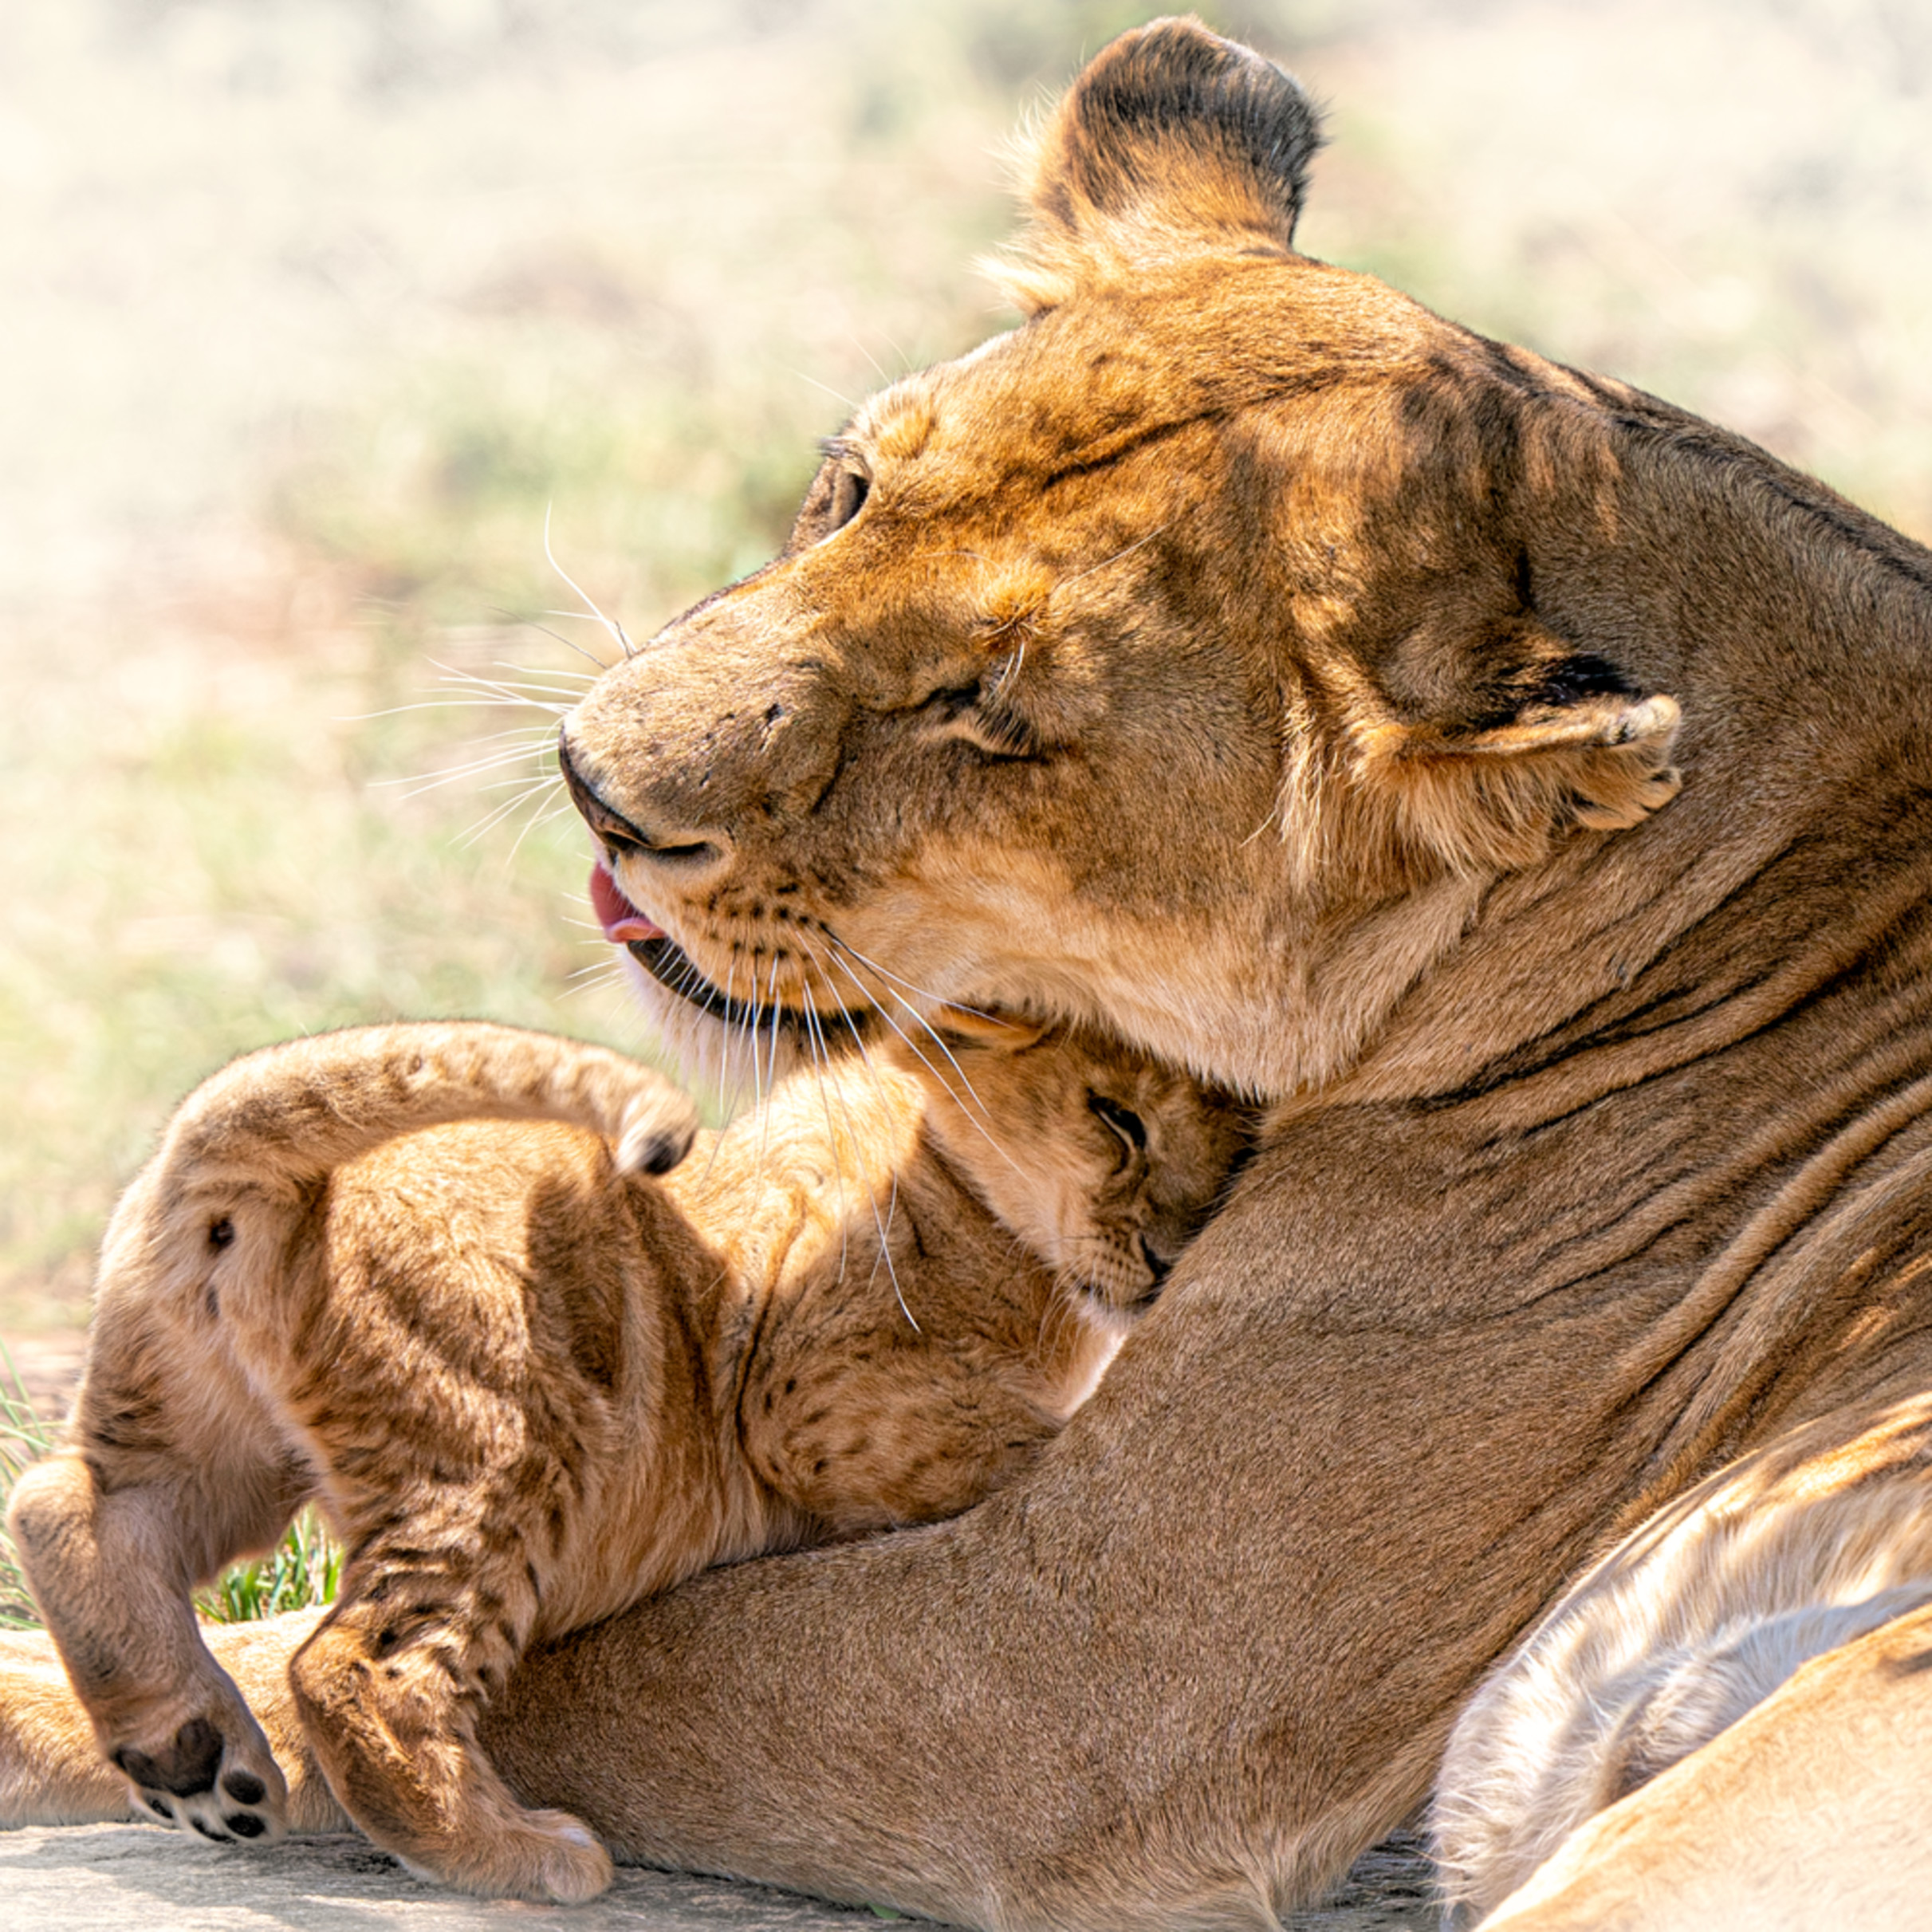 A mother s love pxkzu5